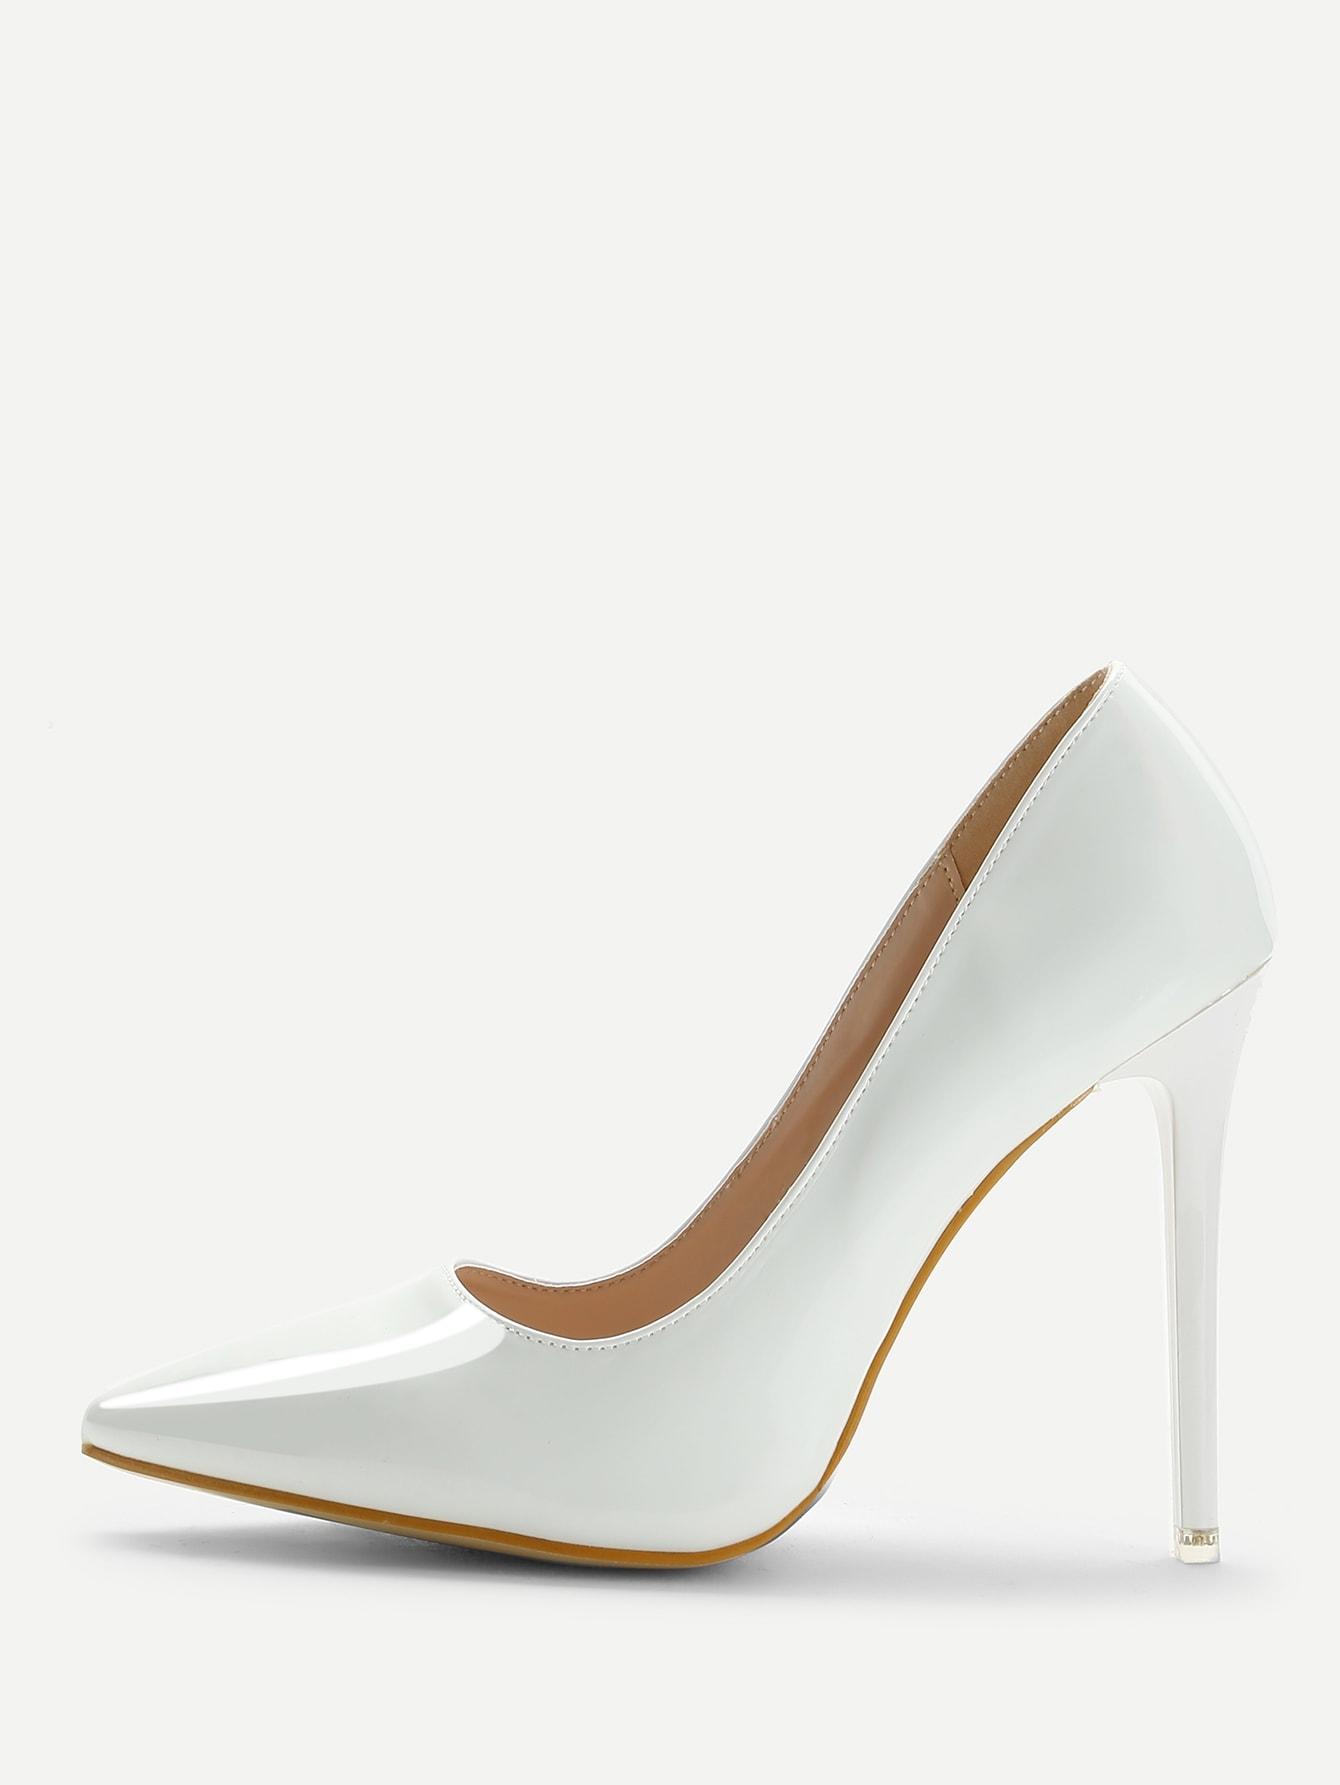 Купить Острый носок флатформа Белый Каблуки, null, SheIn